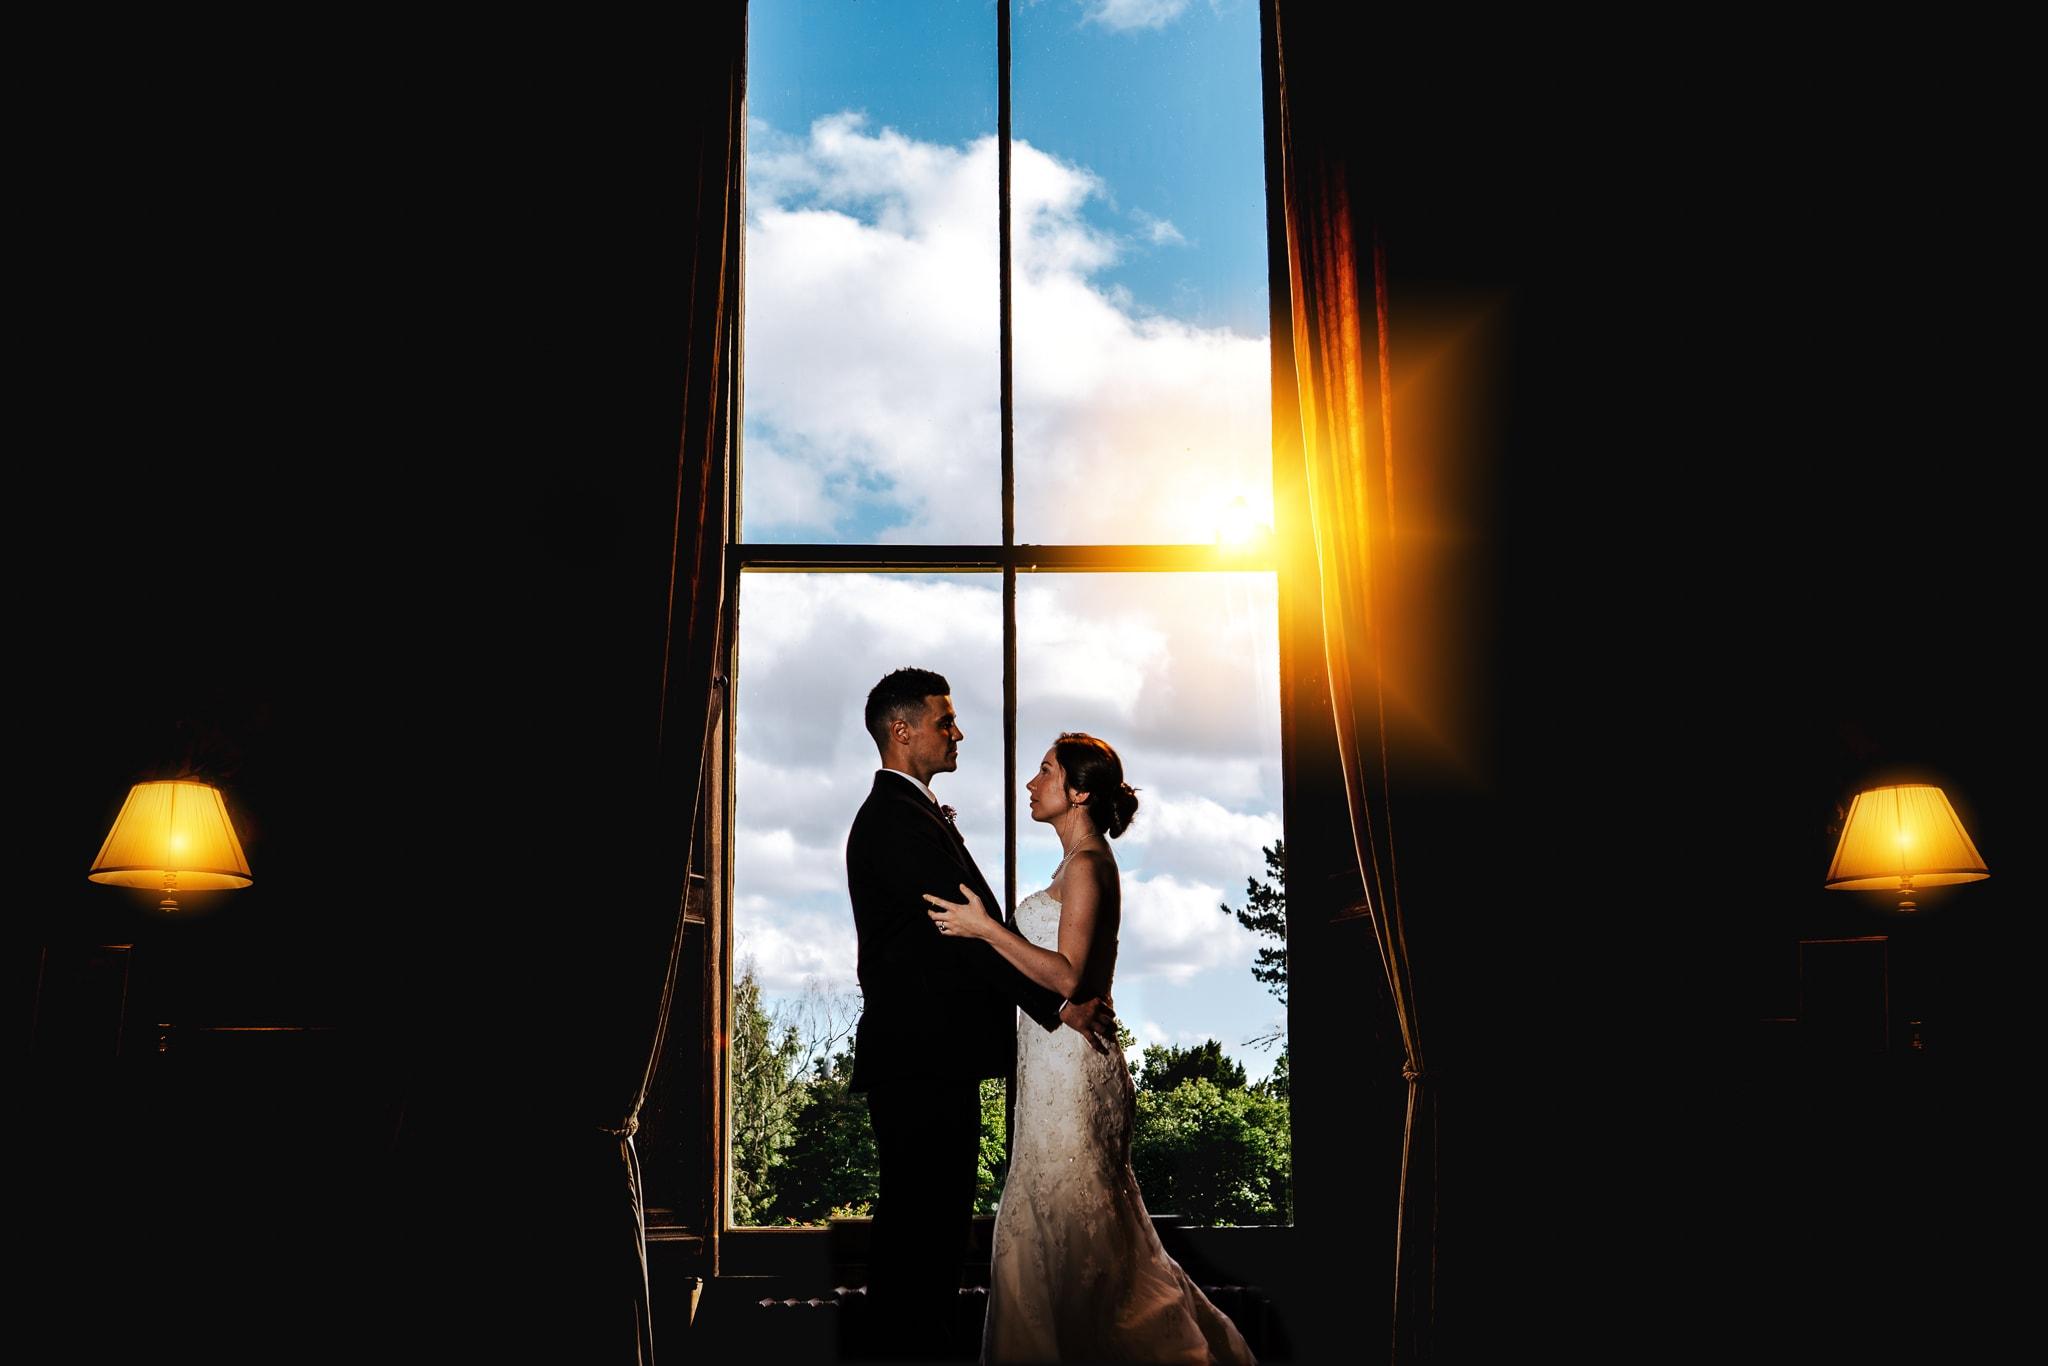 Photograph - Wedding photography